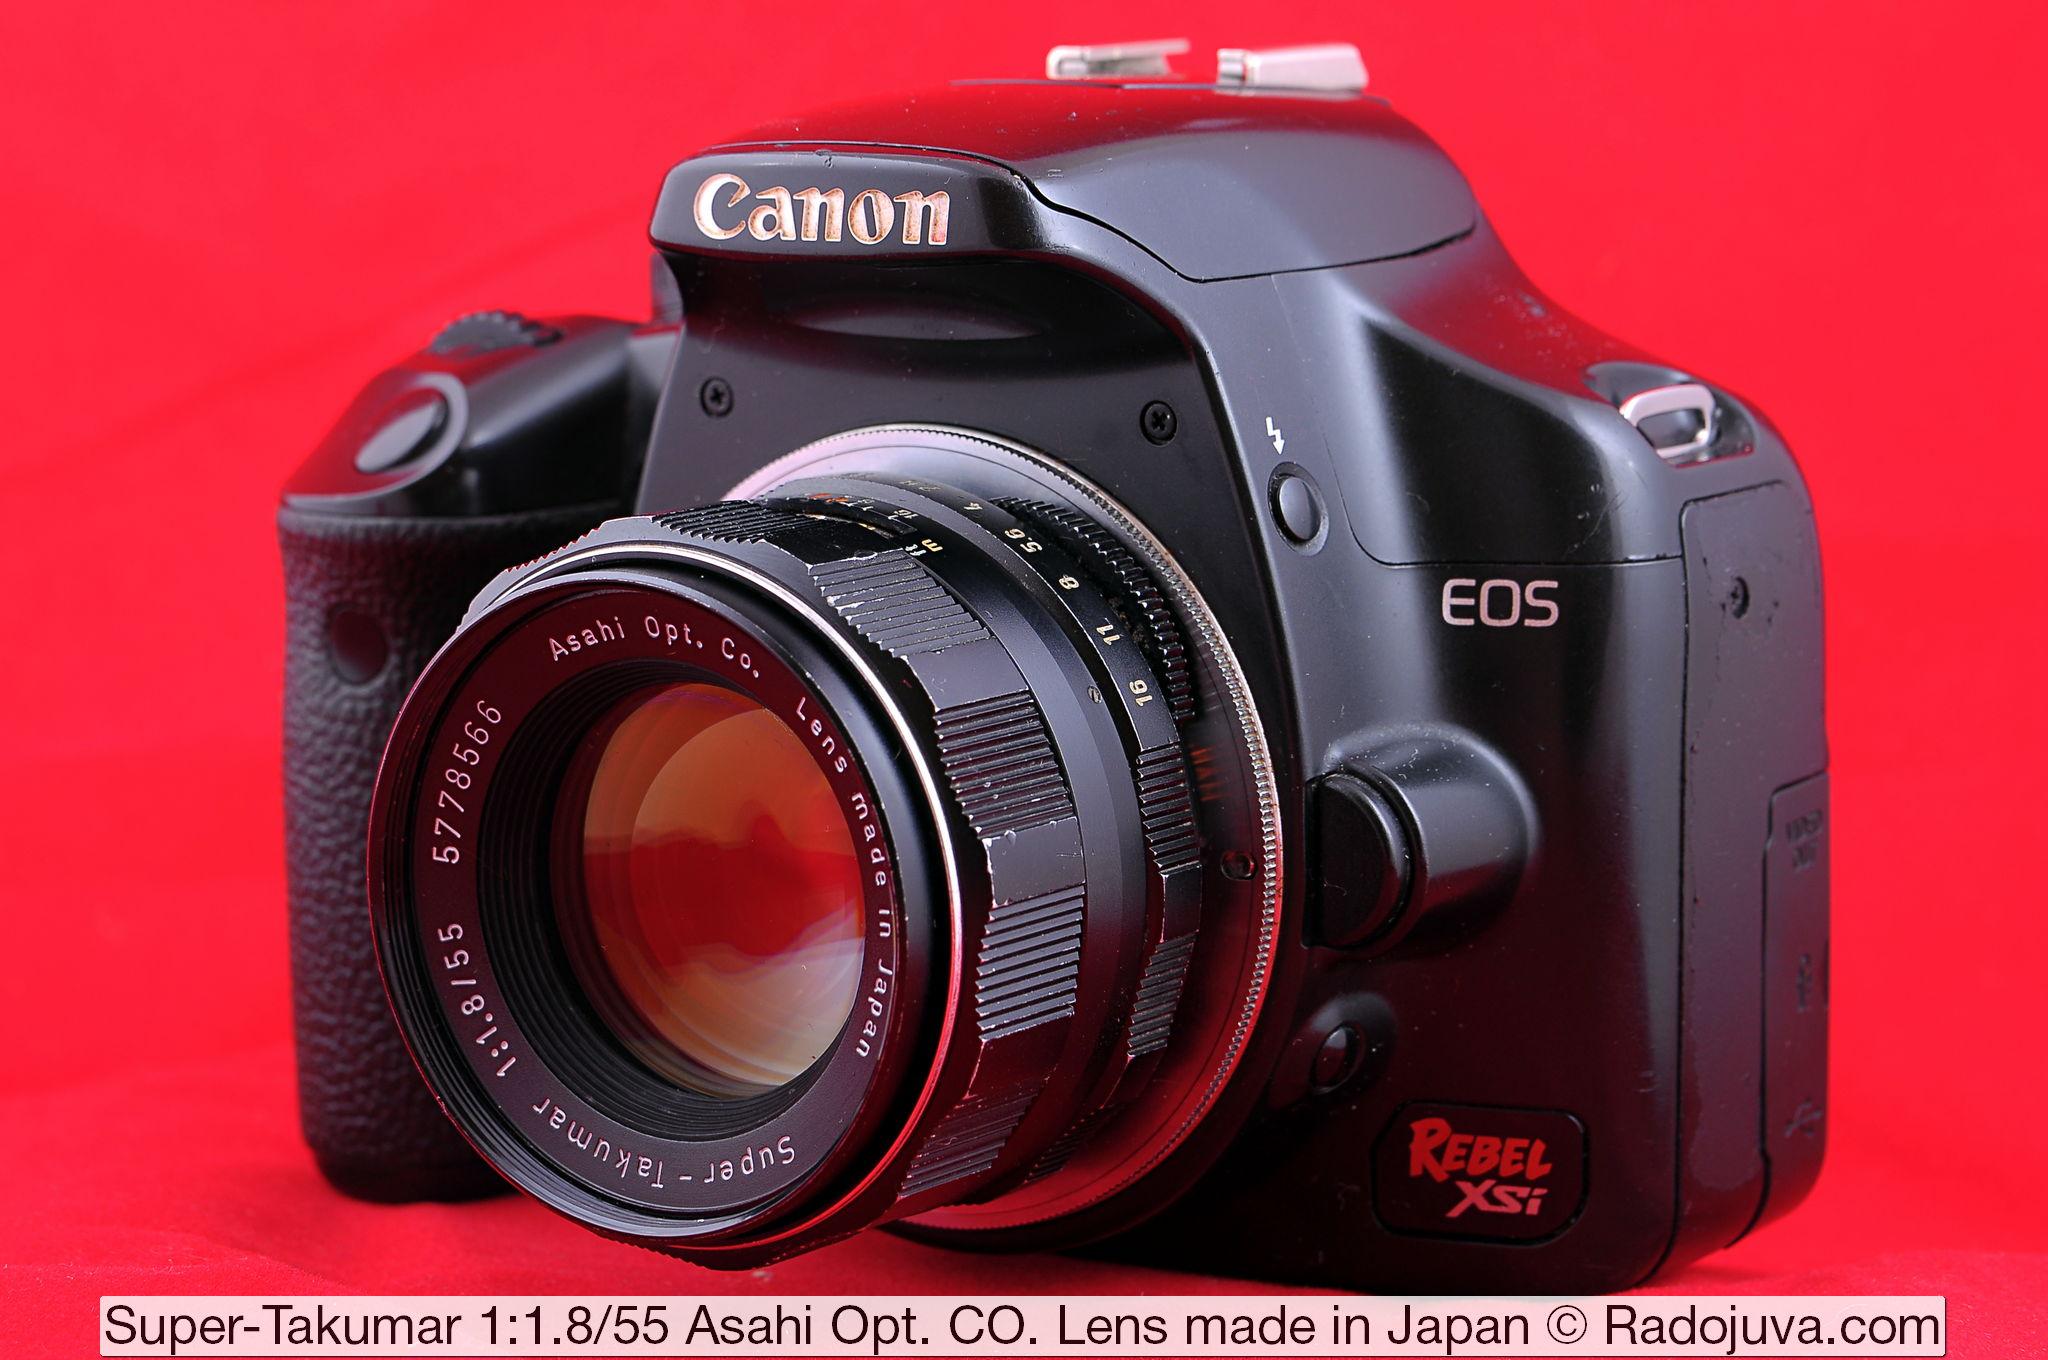 Super-Takumar 1:1.8/55 Asahi Opt. CO. Lens made in Japan